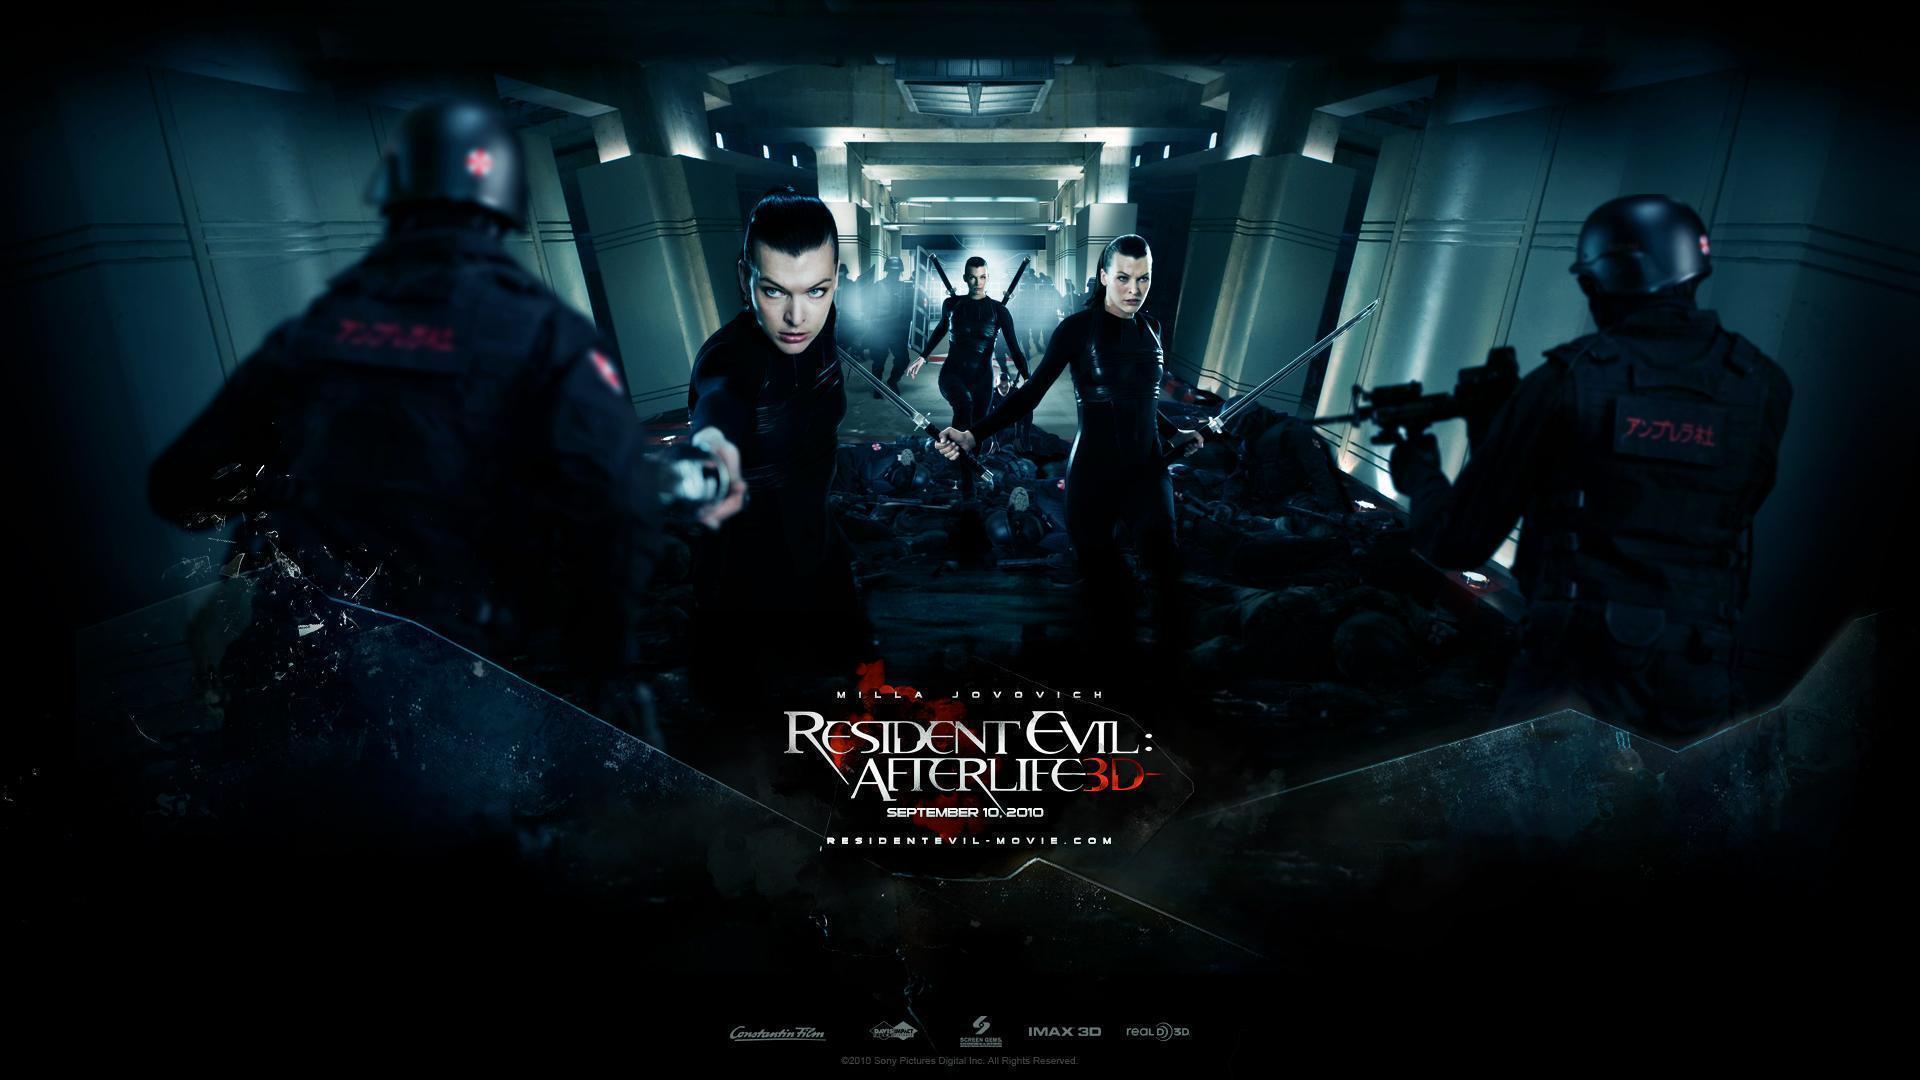 Resident evil wallpapers hd wallpaper cave - Resident evil afterlife wallpaper ...